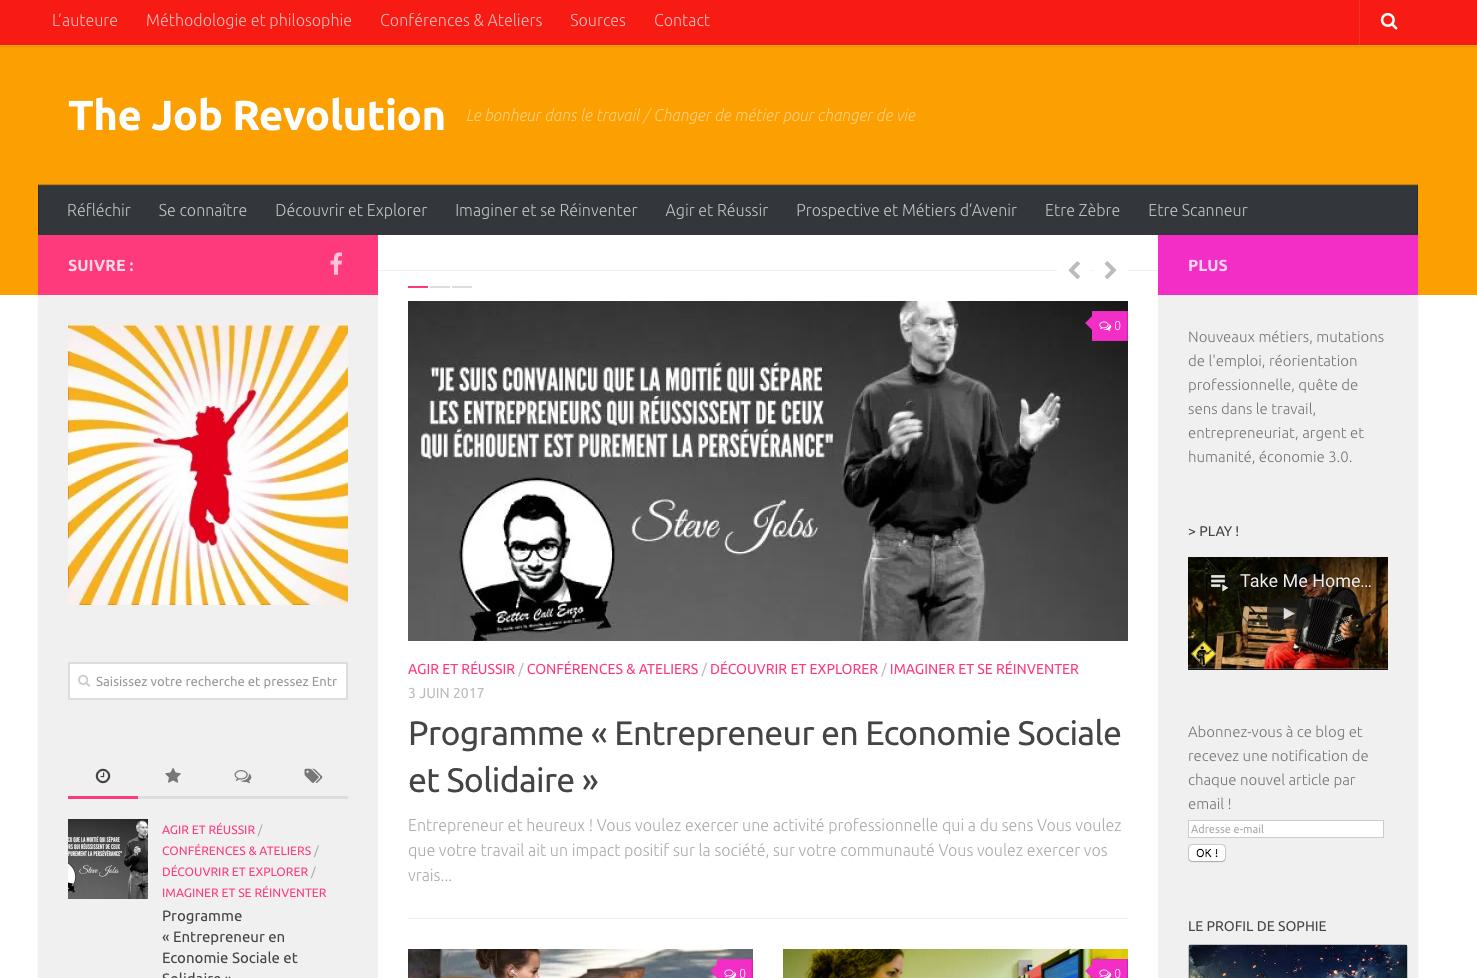 Le magazine The Job Revolution